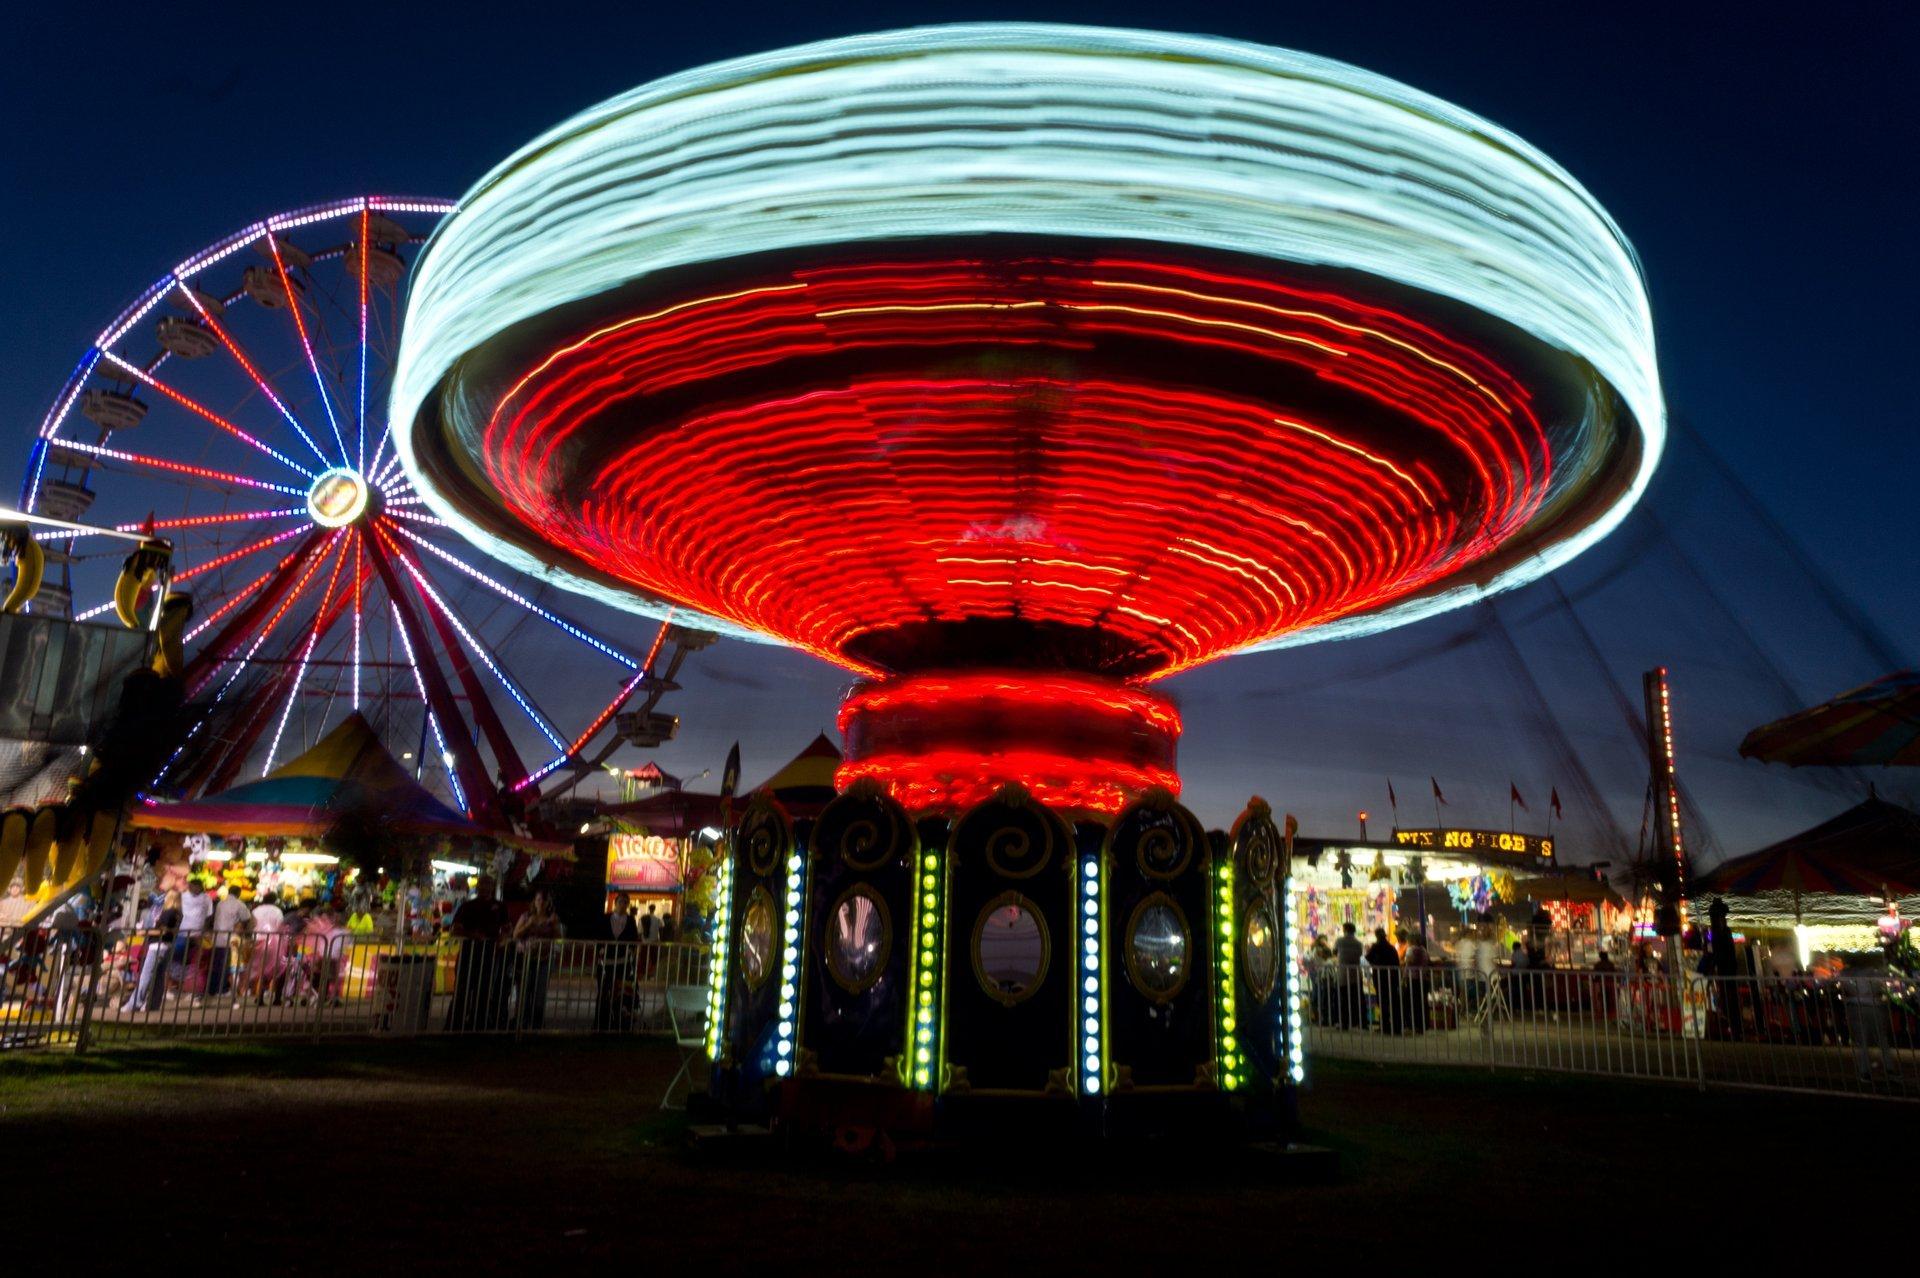 Georgia National Fair in Georgia 2020 - Best Time